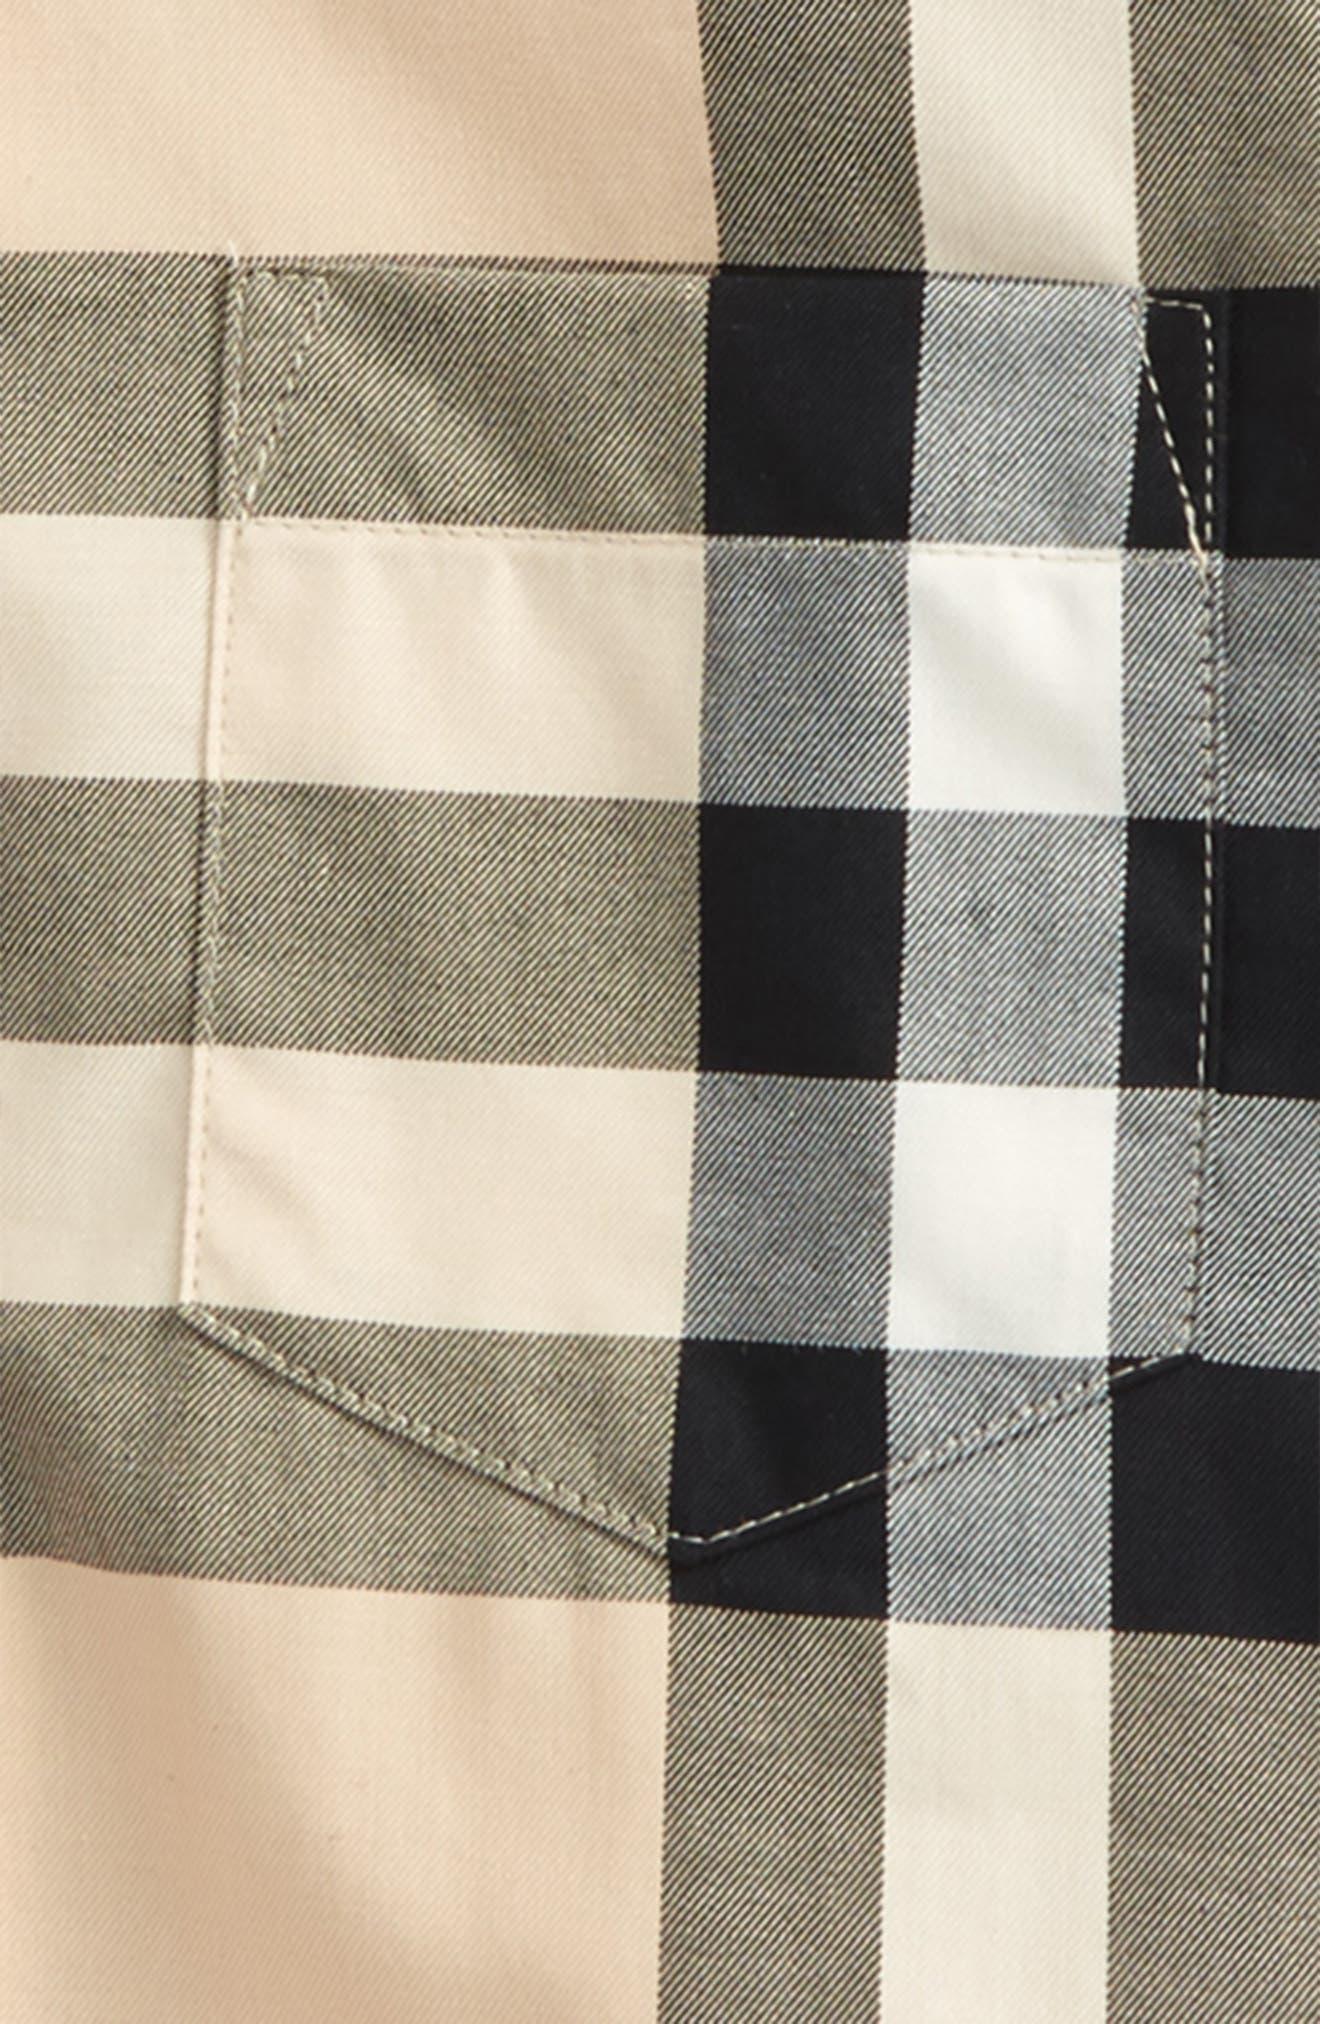 Fred Check Shirt,                             Alternate thumbnail 2, color,                             272